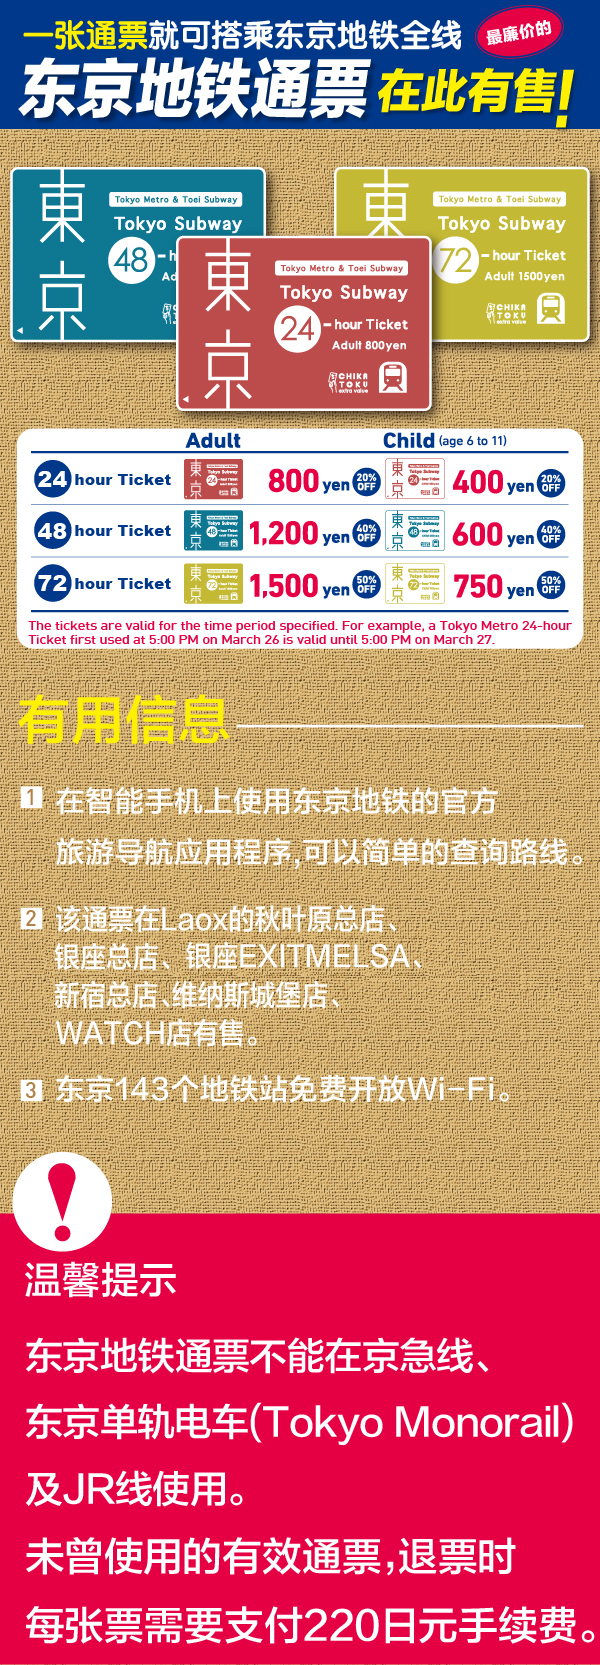 image_subway_cn_02